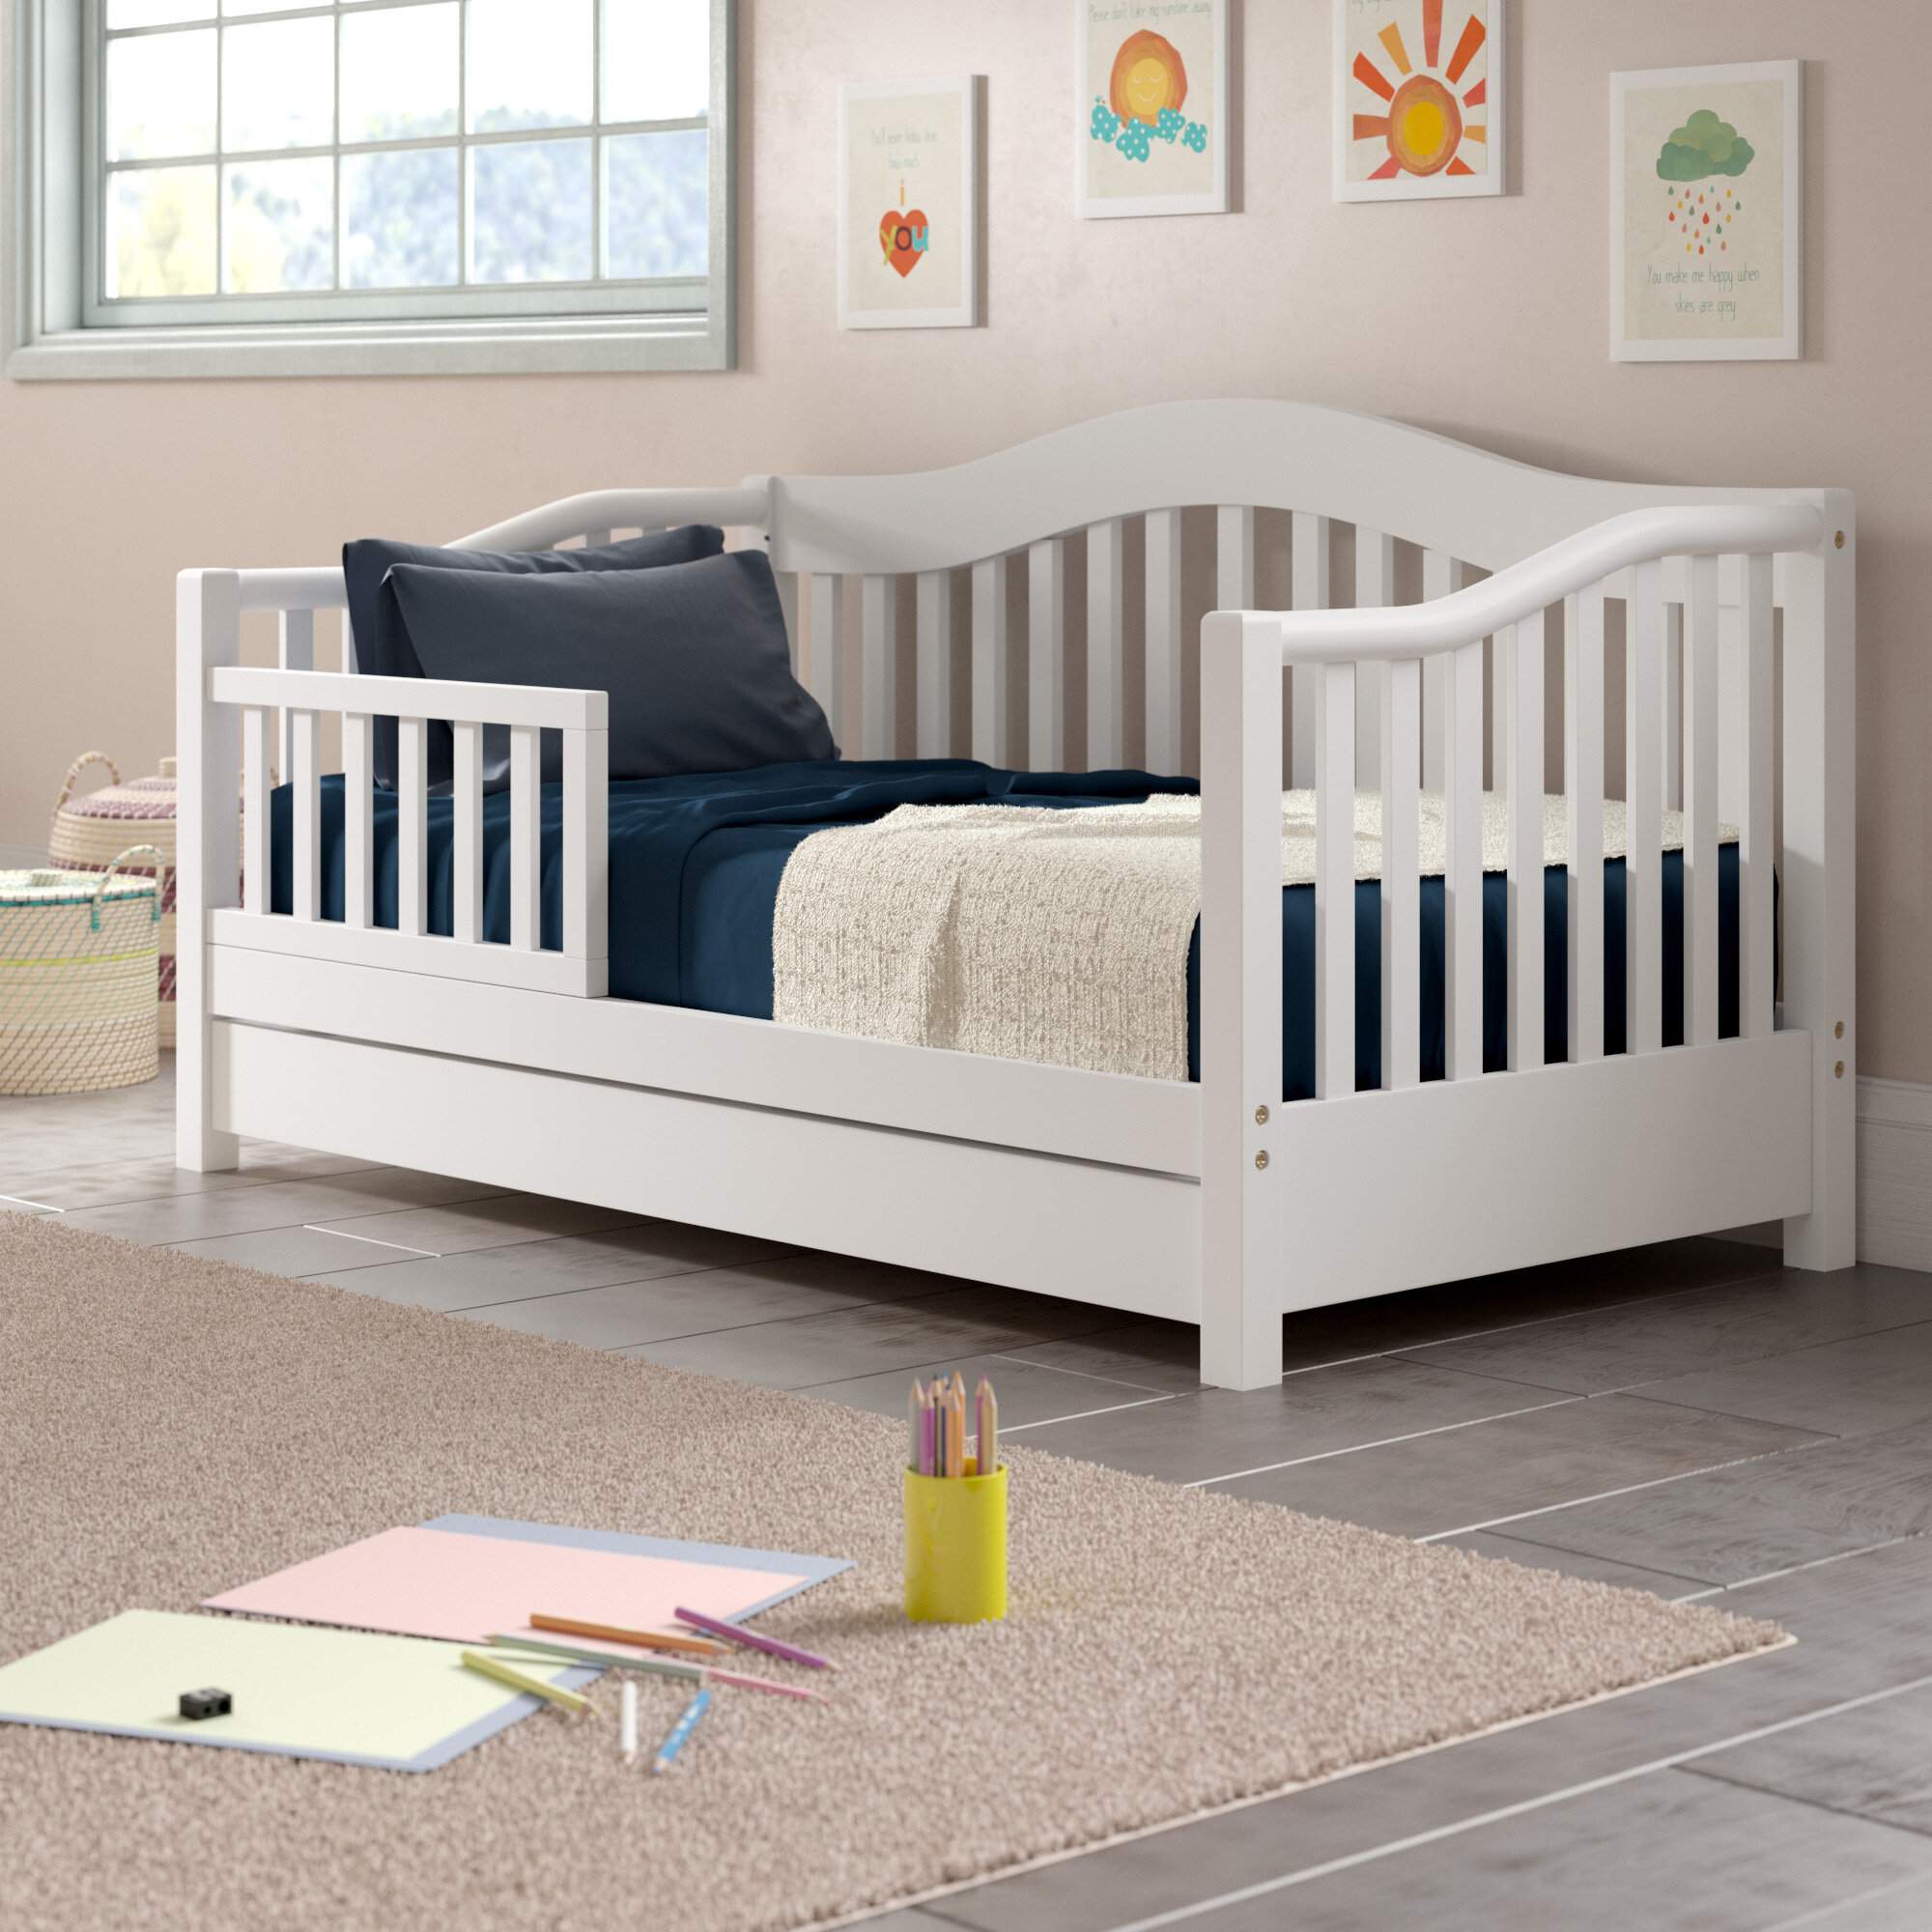 Kids Beds On Sale Wayfair